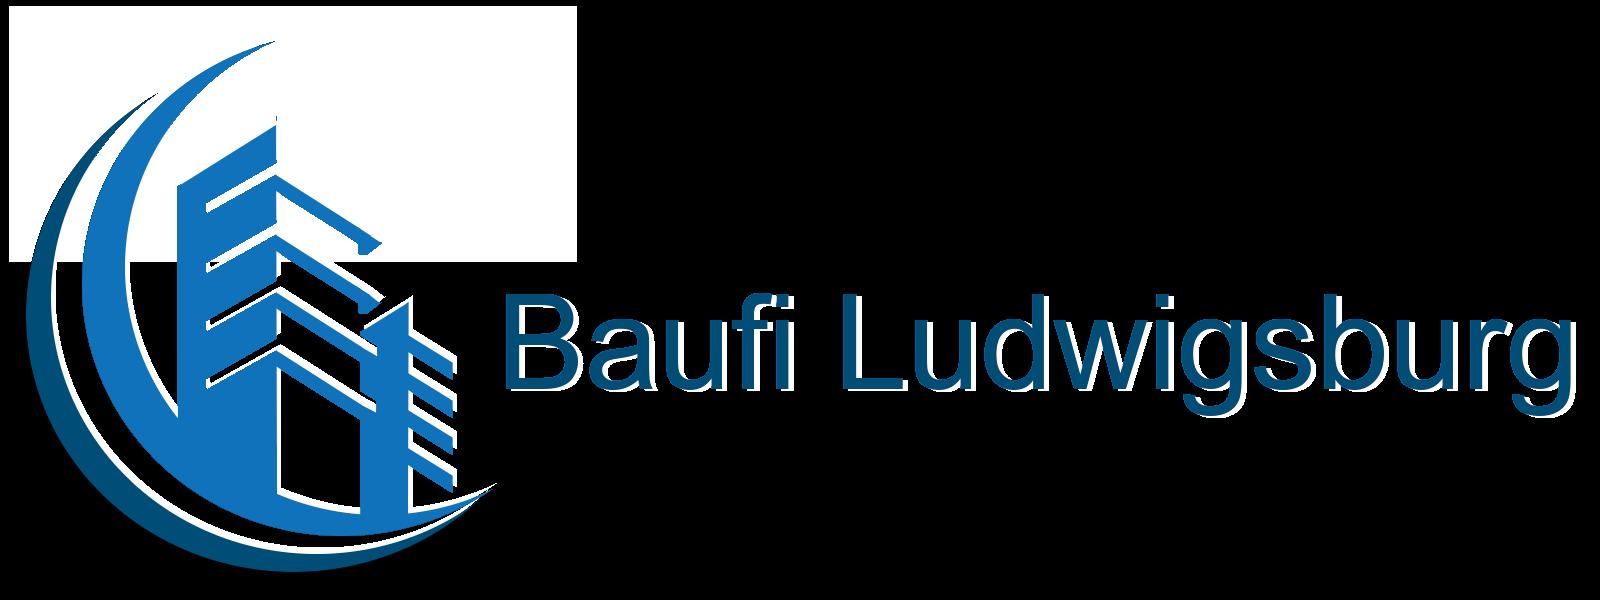 Baufi Ludwigsburg